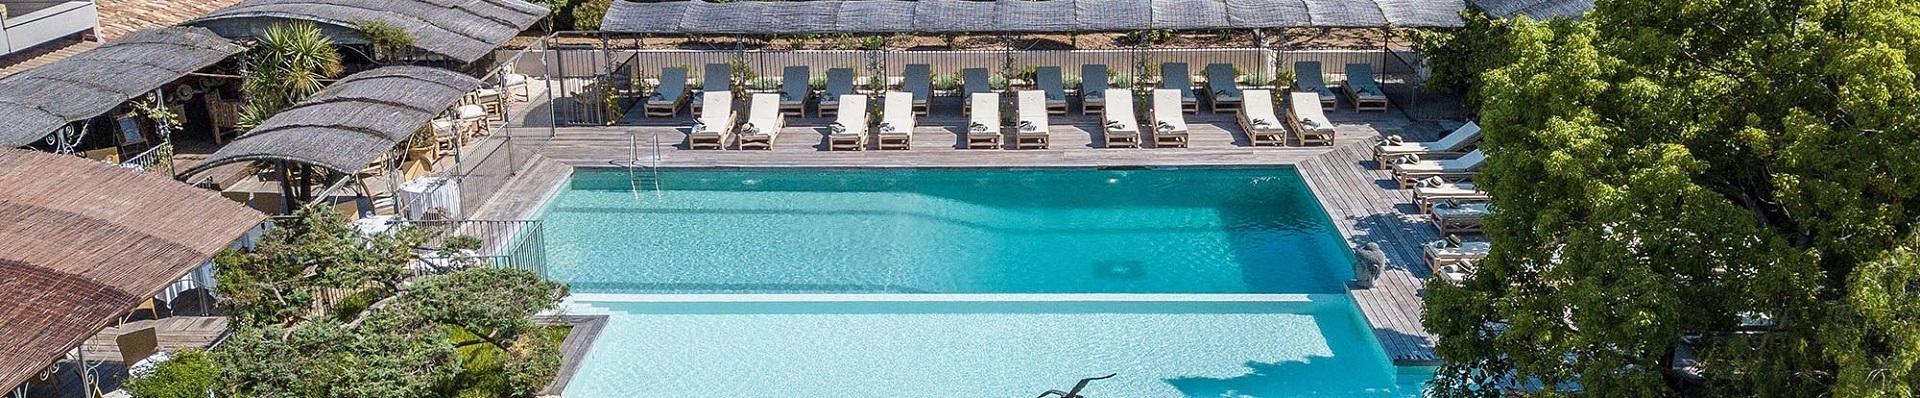 hotel-roi-theodore-et-spa-porto-vecchio-seminaires-de-caractere-piscine